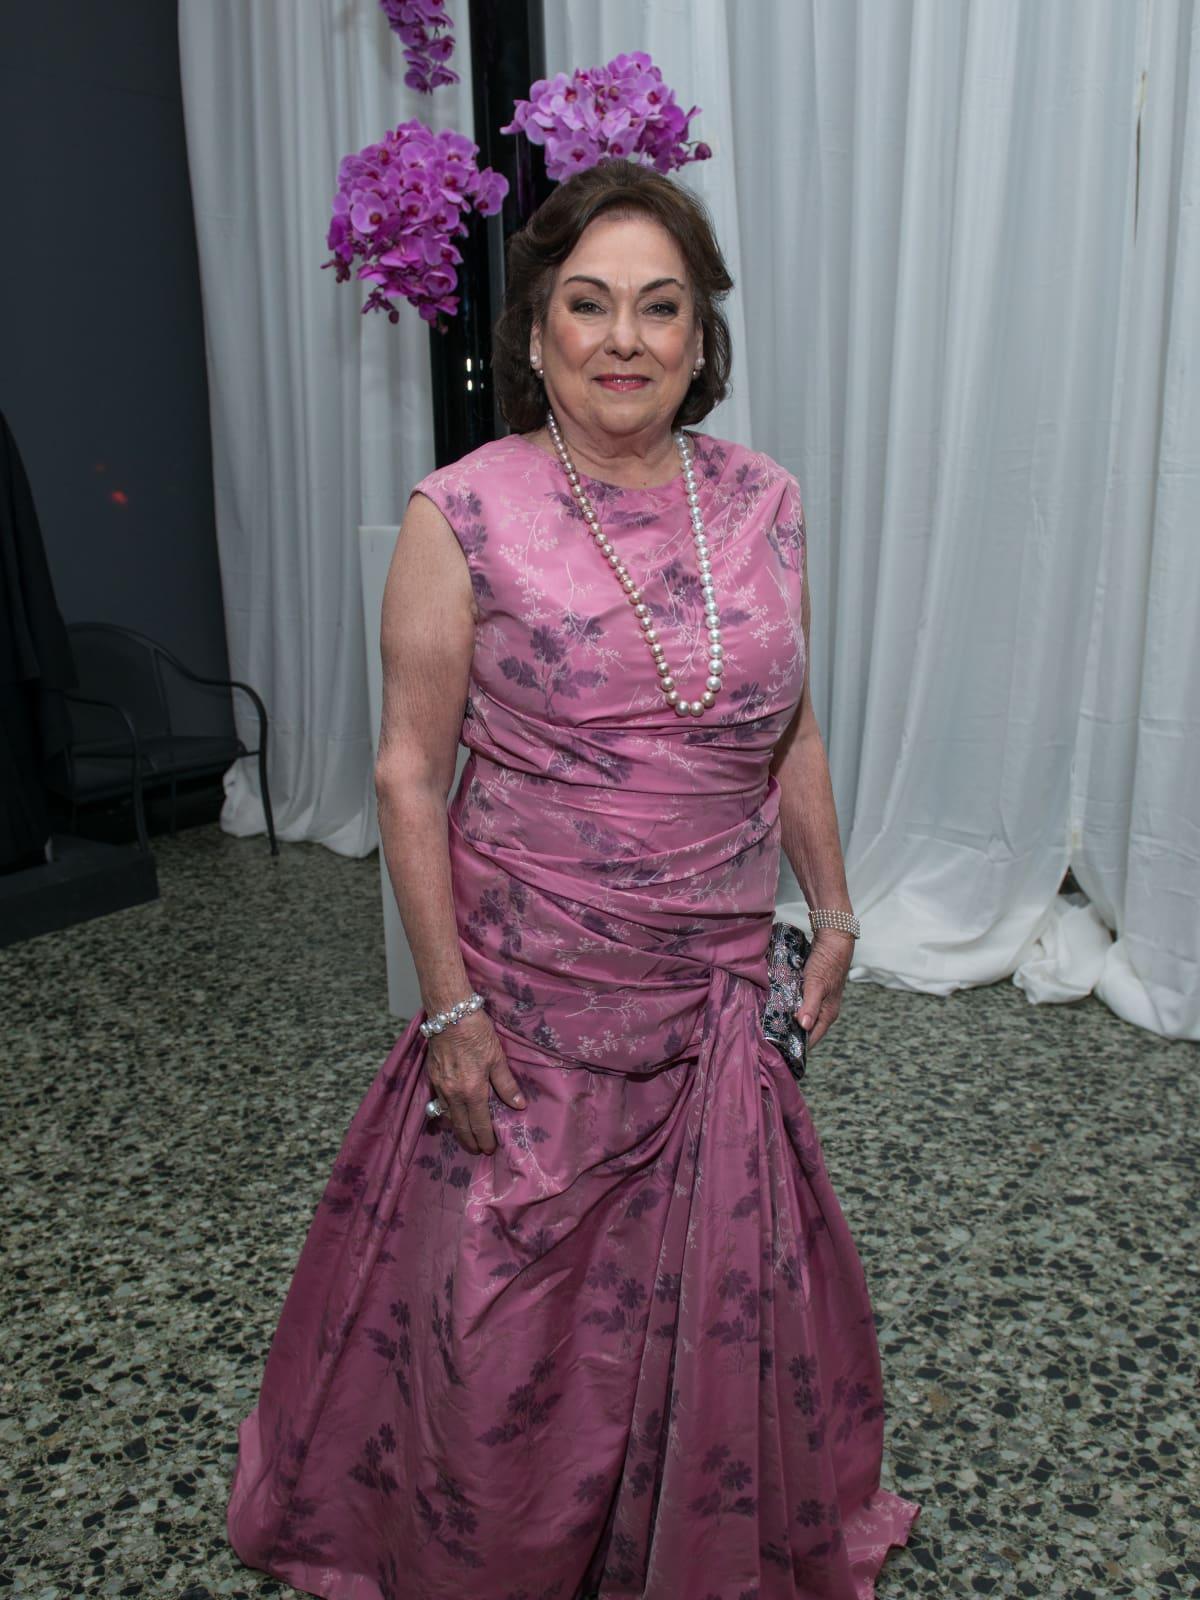 Houston, MFAH Oscar de la Renta Ball, Rose Cullne, Oscar de la Renta